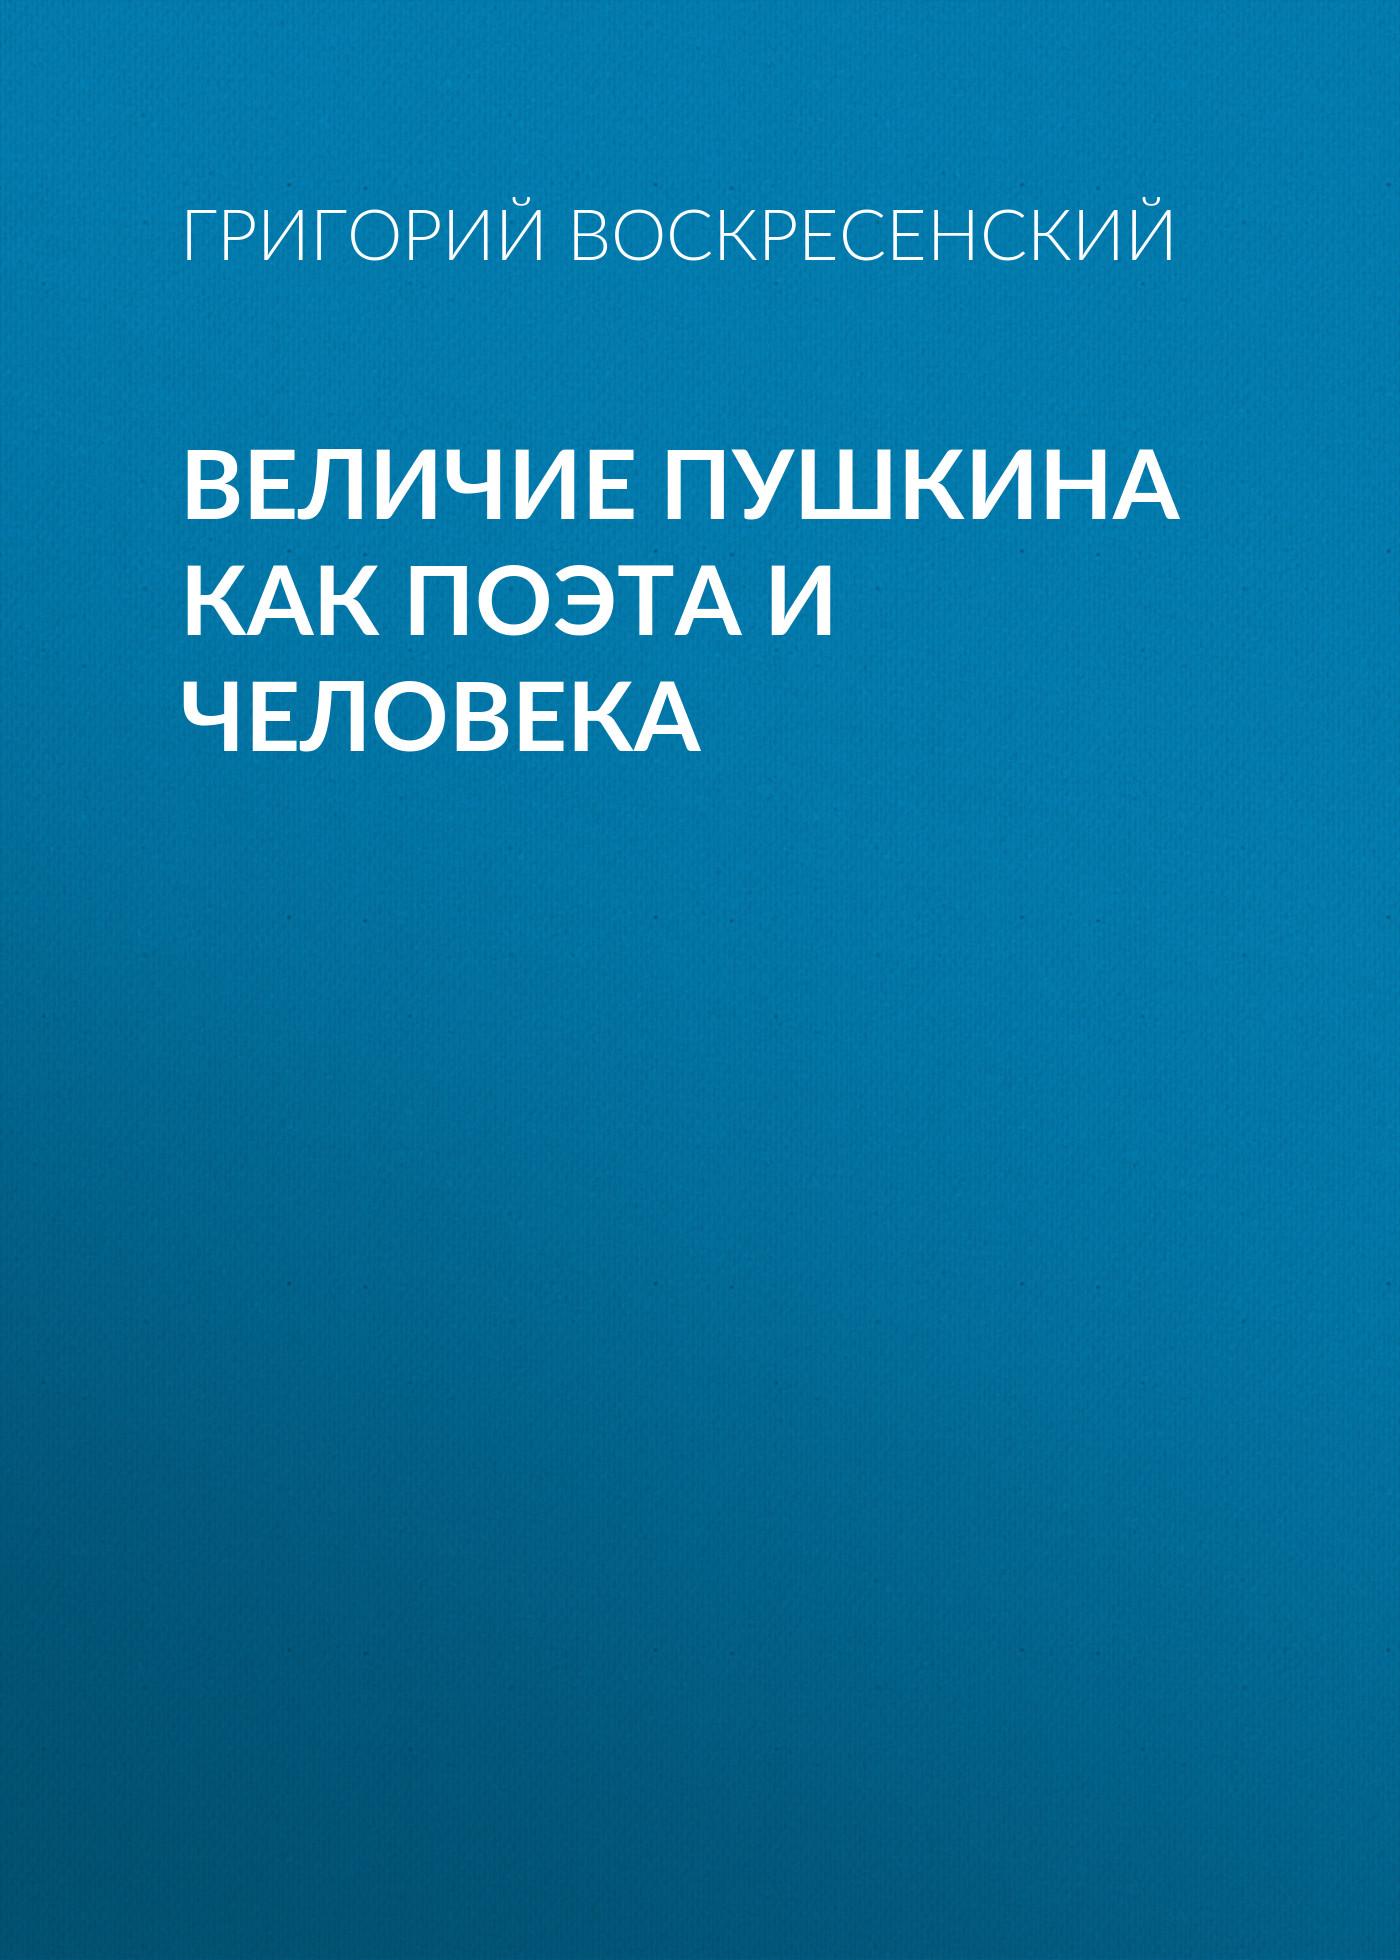 Величие Пушкина как поэта и человека